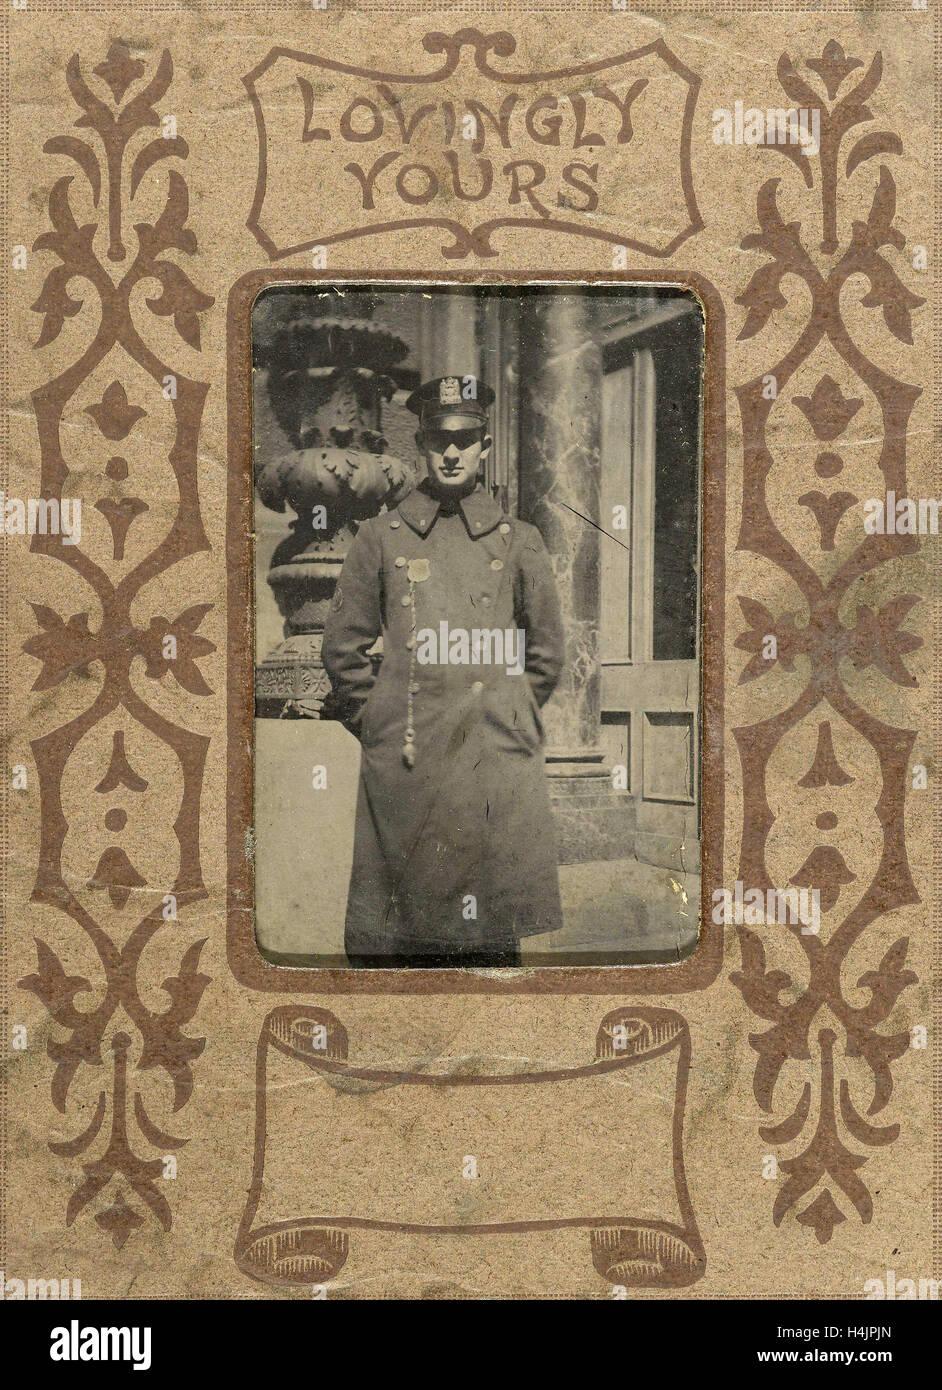 Amoureusement Vôtre, anonyme, c. 1900 - c. 1920 Photo Stock